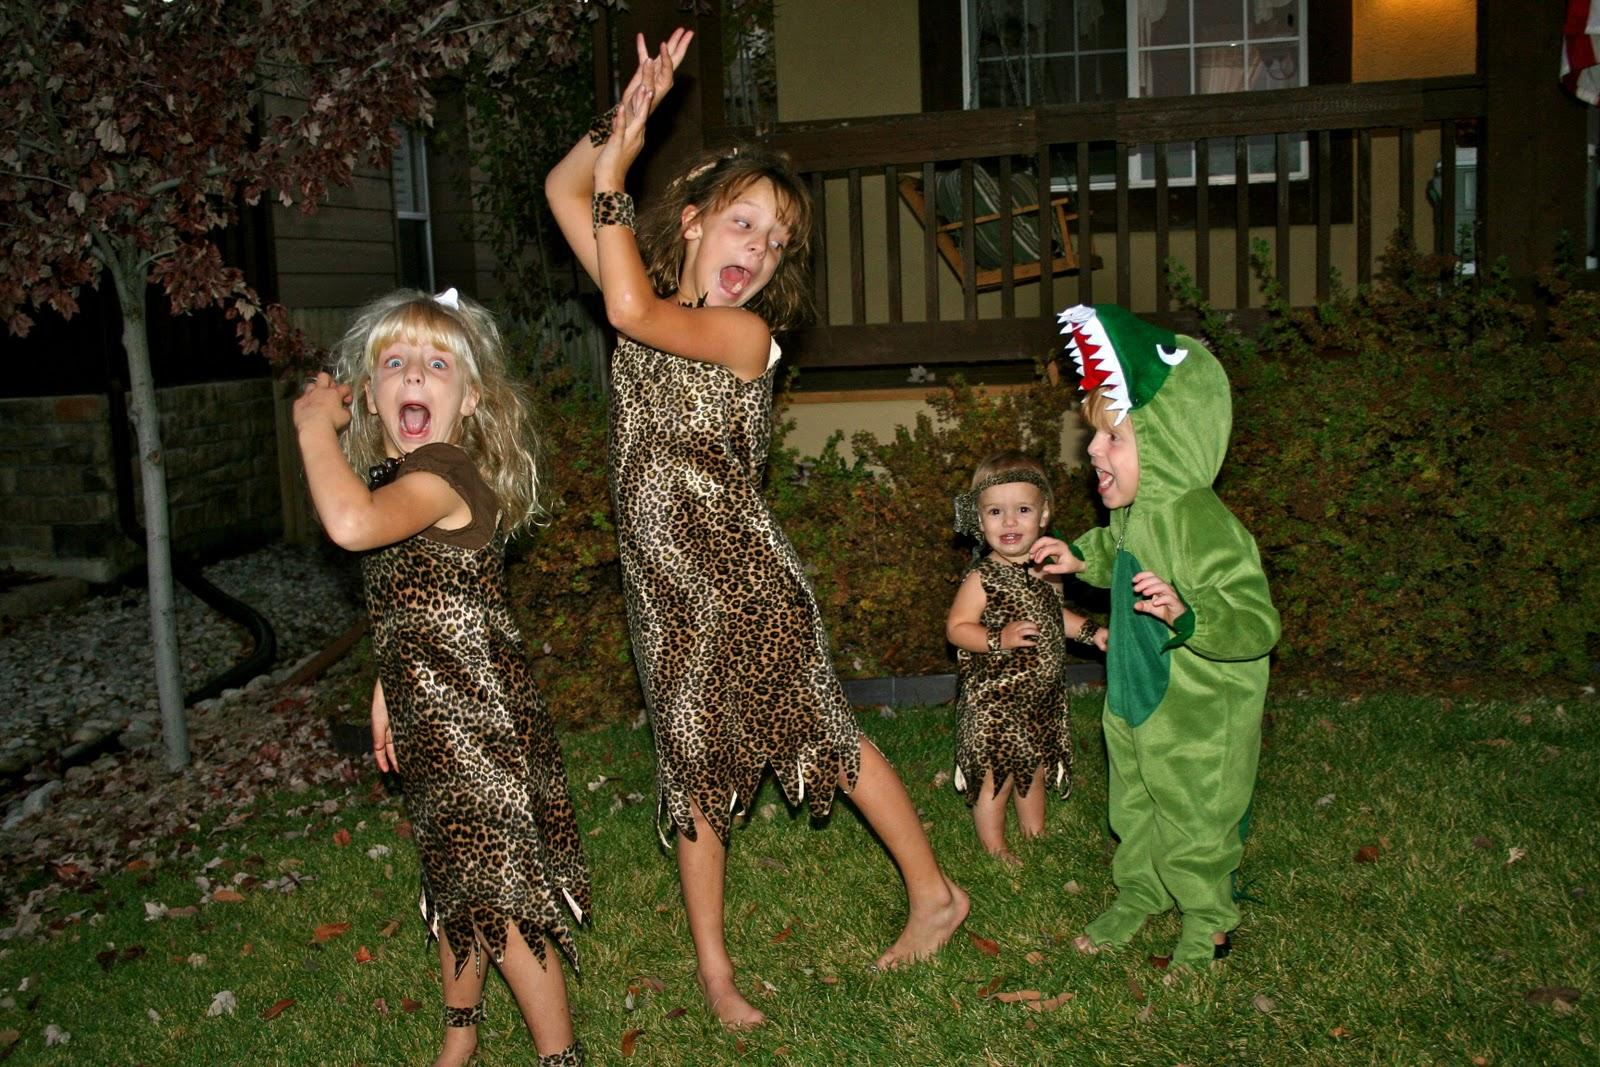 Caveman Dress Up Ideas : Flibbertigibberish: cave girls vs. the brodysaurus